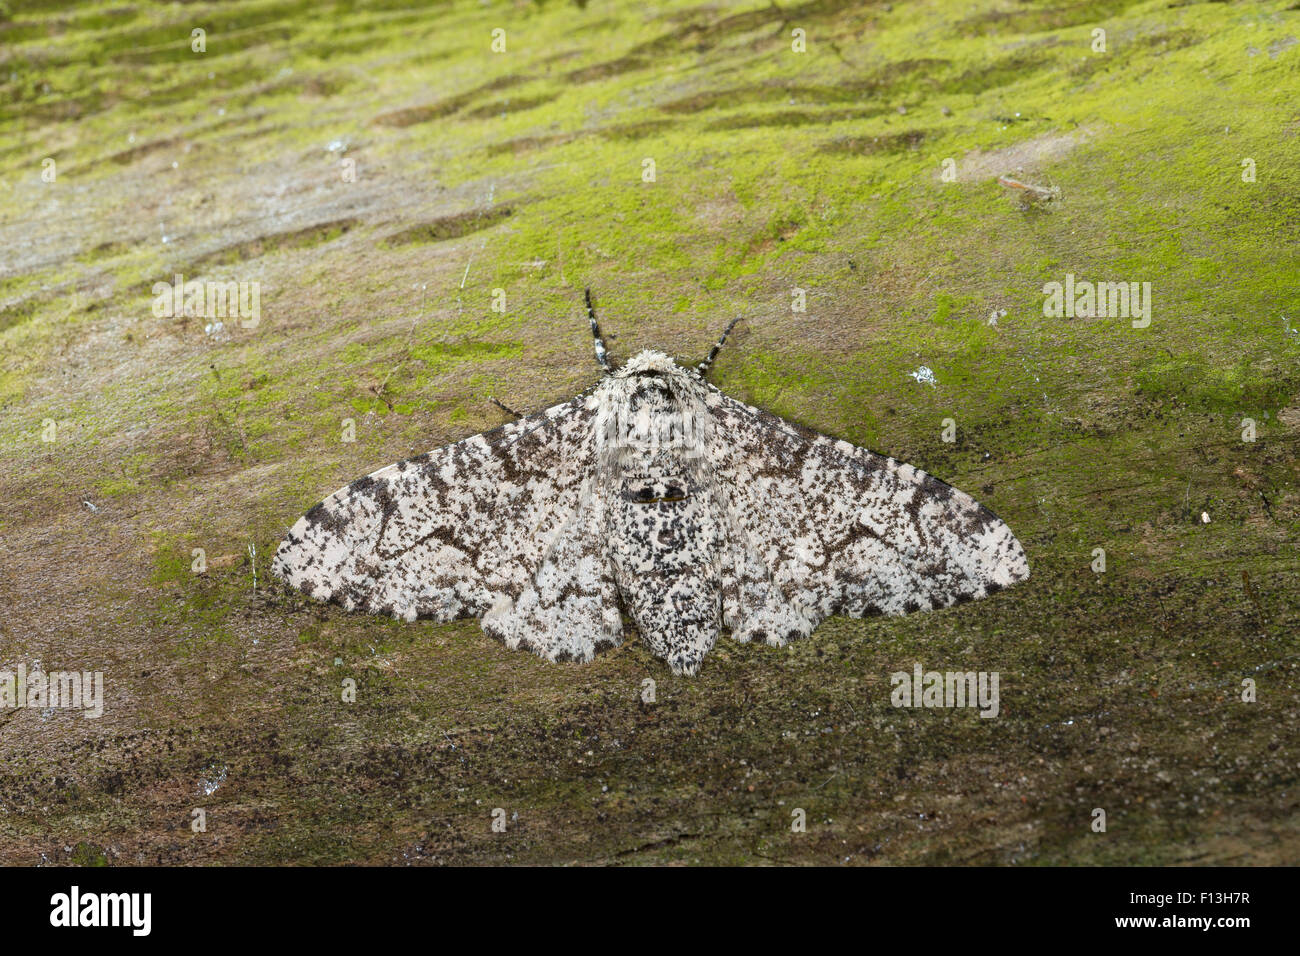 Peppered moth, Birkenspanner, Birken-Spanner, Biston betularia, Biston betularius, Amphidasis betularia, La phalène - Stock Image